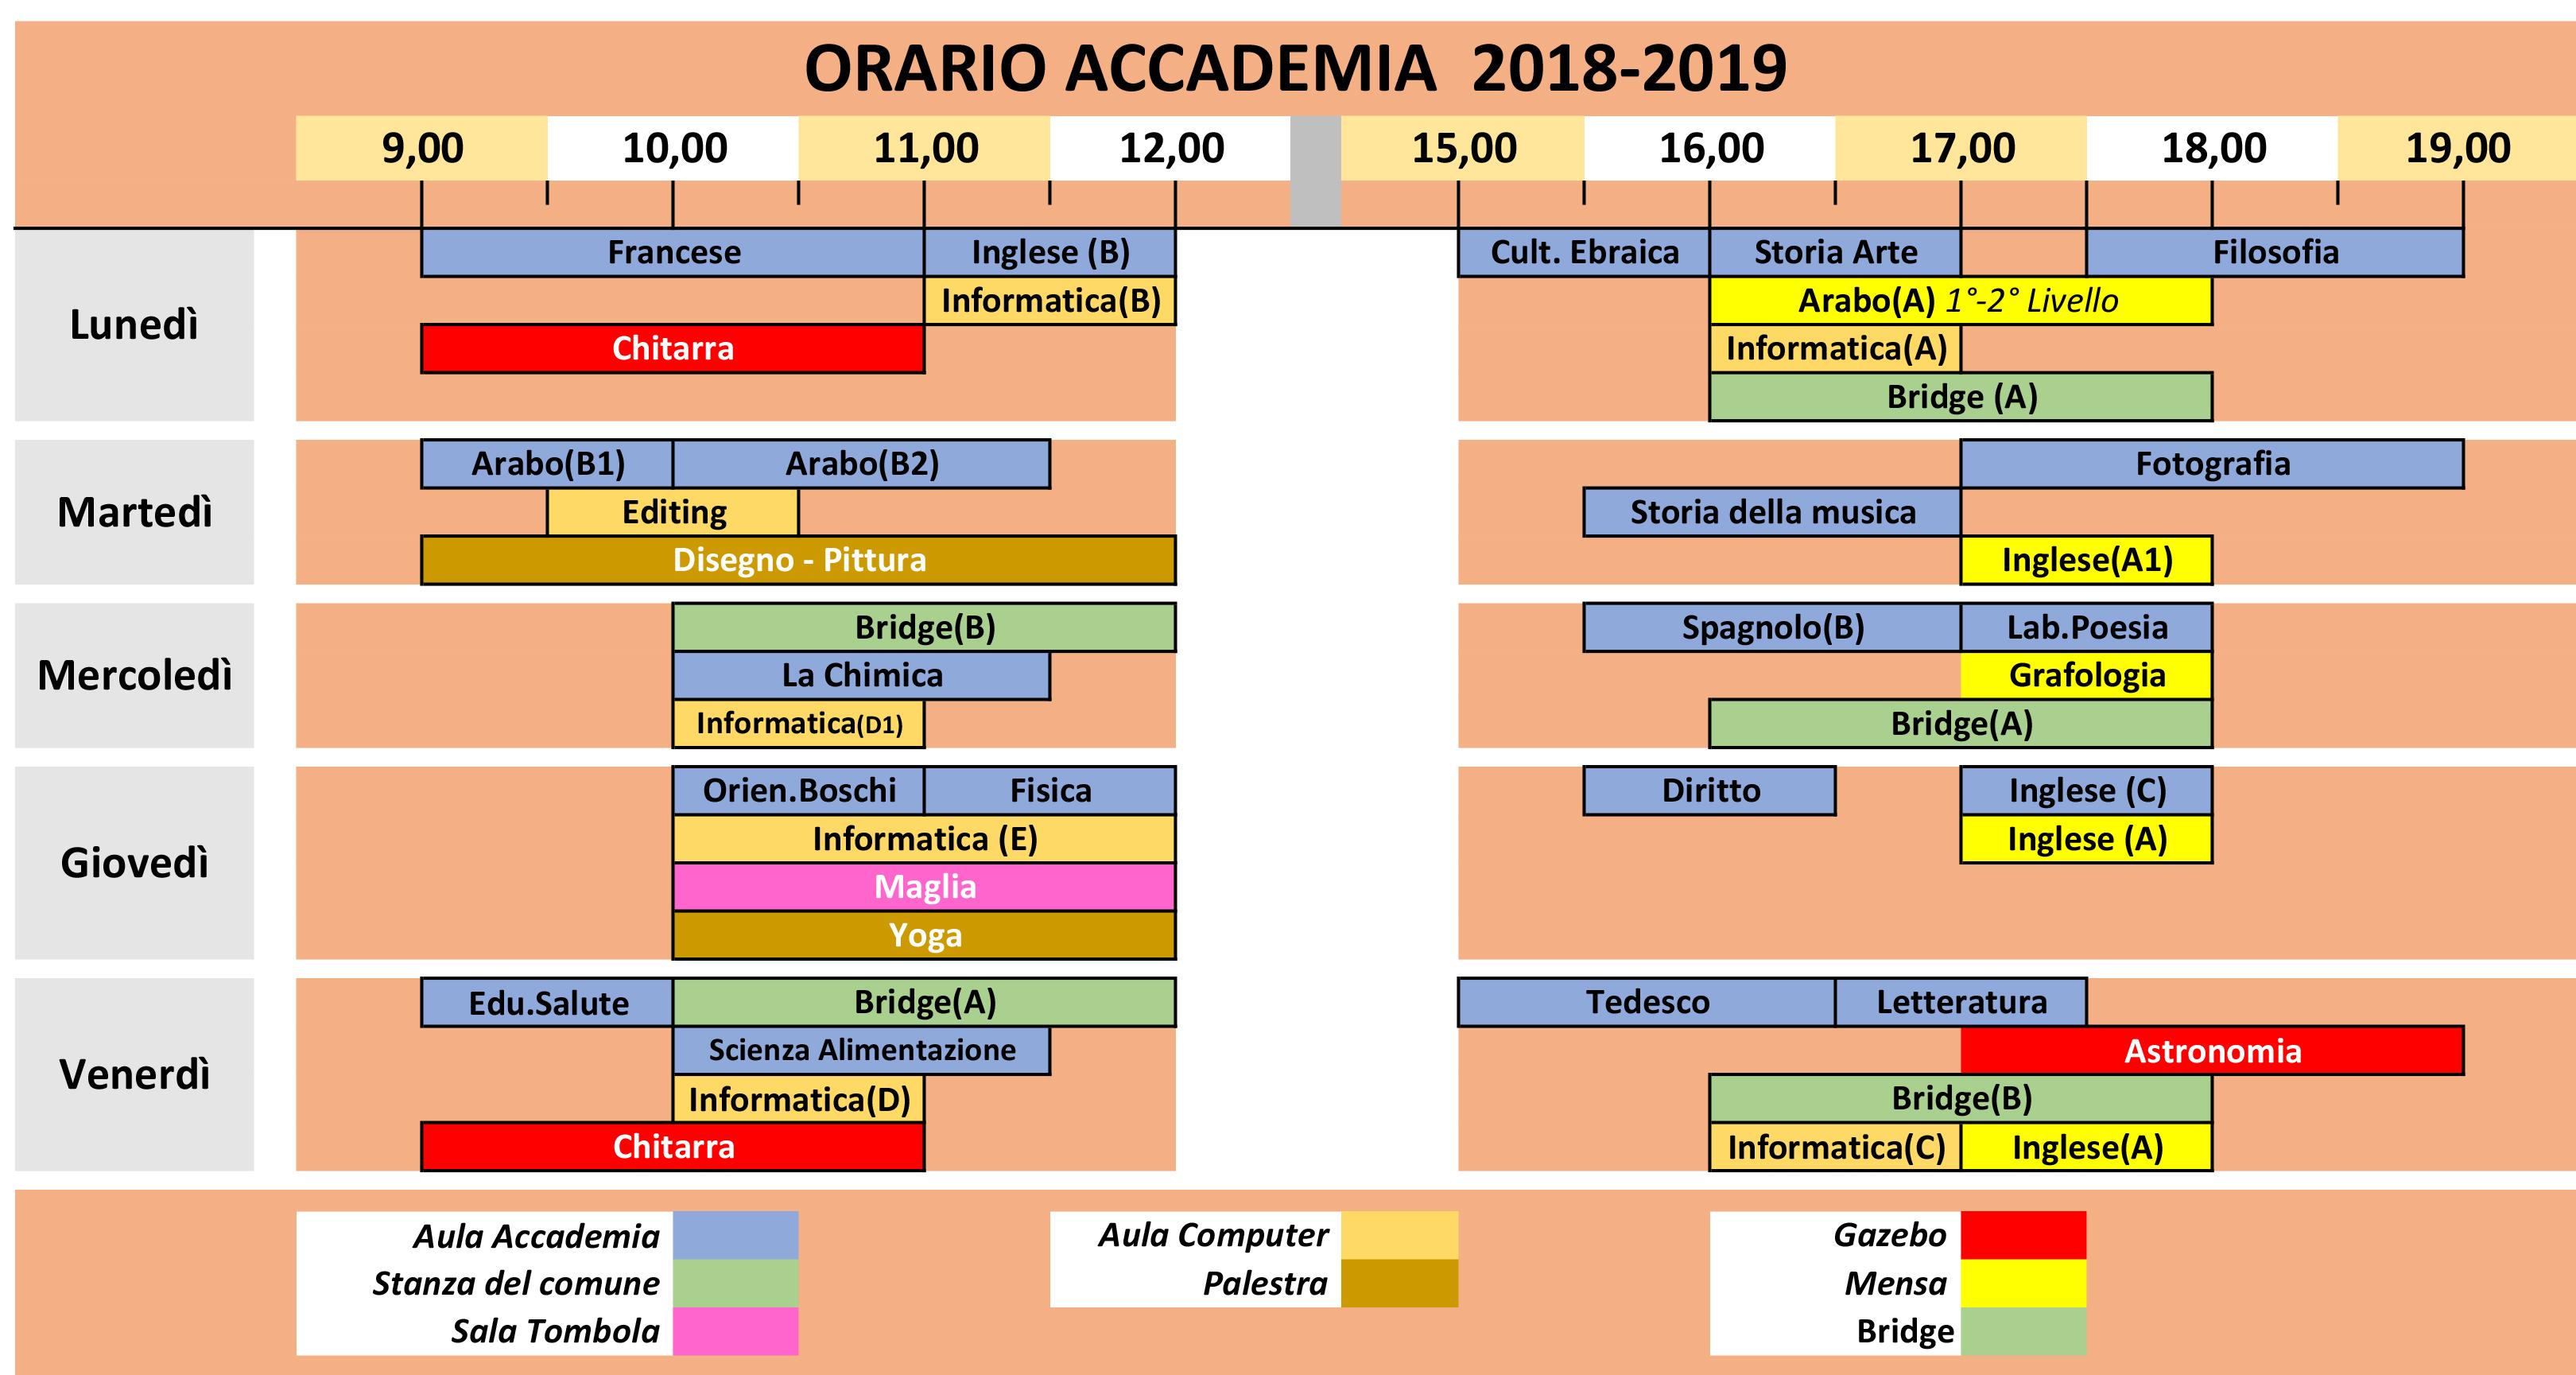 Orario Accademia.xlsx